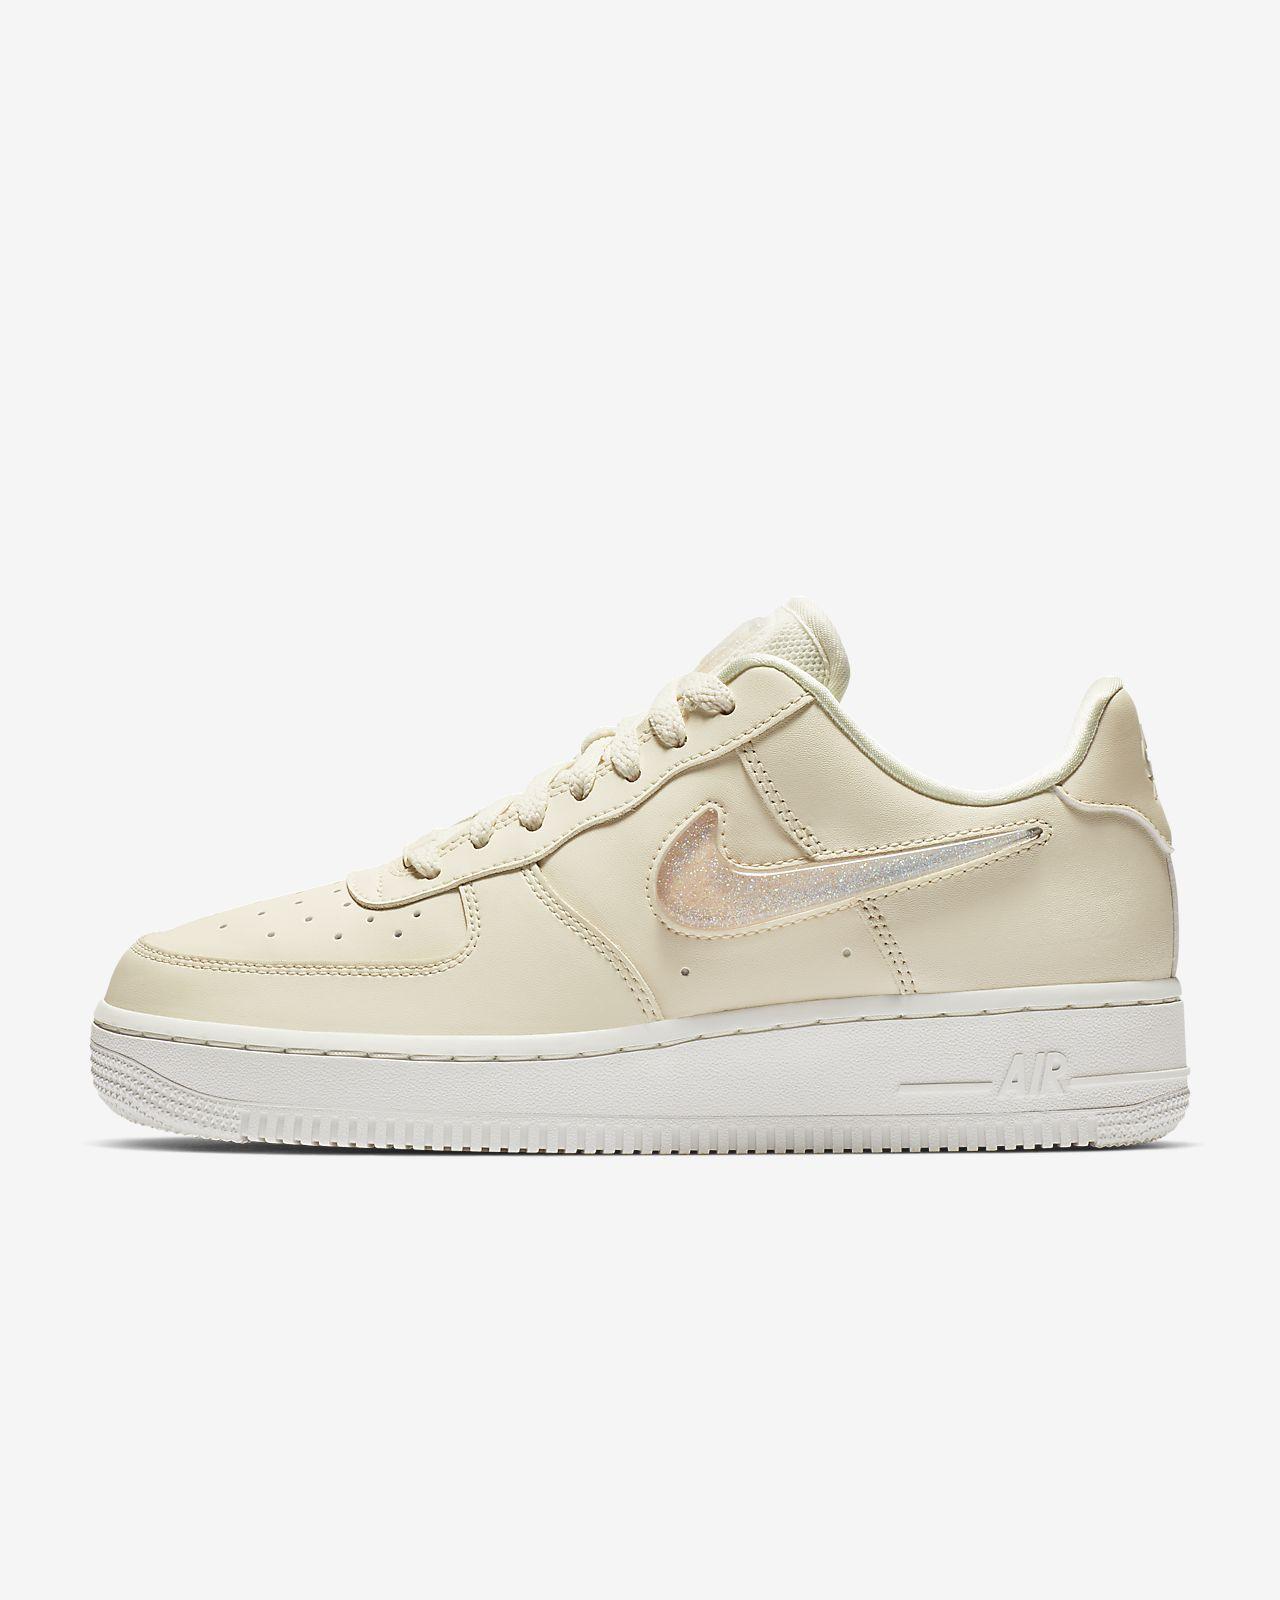 premium selection b53a8 89b1d ... Nike Air Force 1 07 SE Premium – sko til kvinder